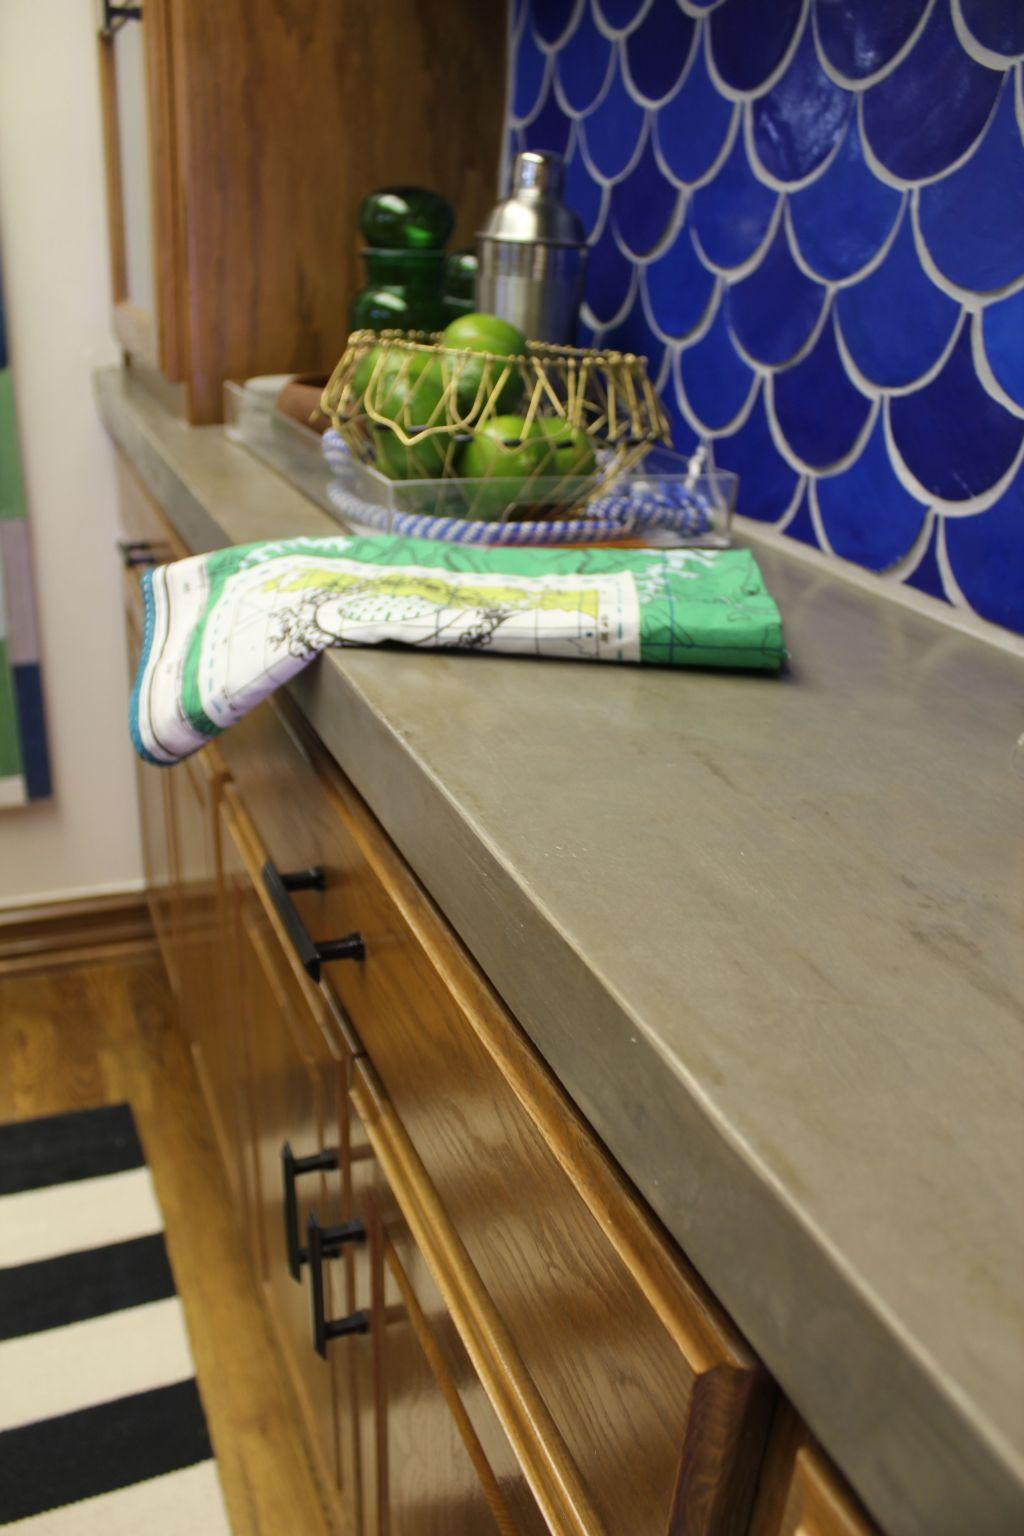 20 unique countertops guaranteed make kitchen stand kitchen countertop materials Home Decorating Trends Homedit